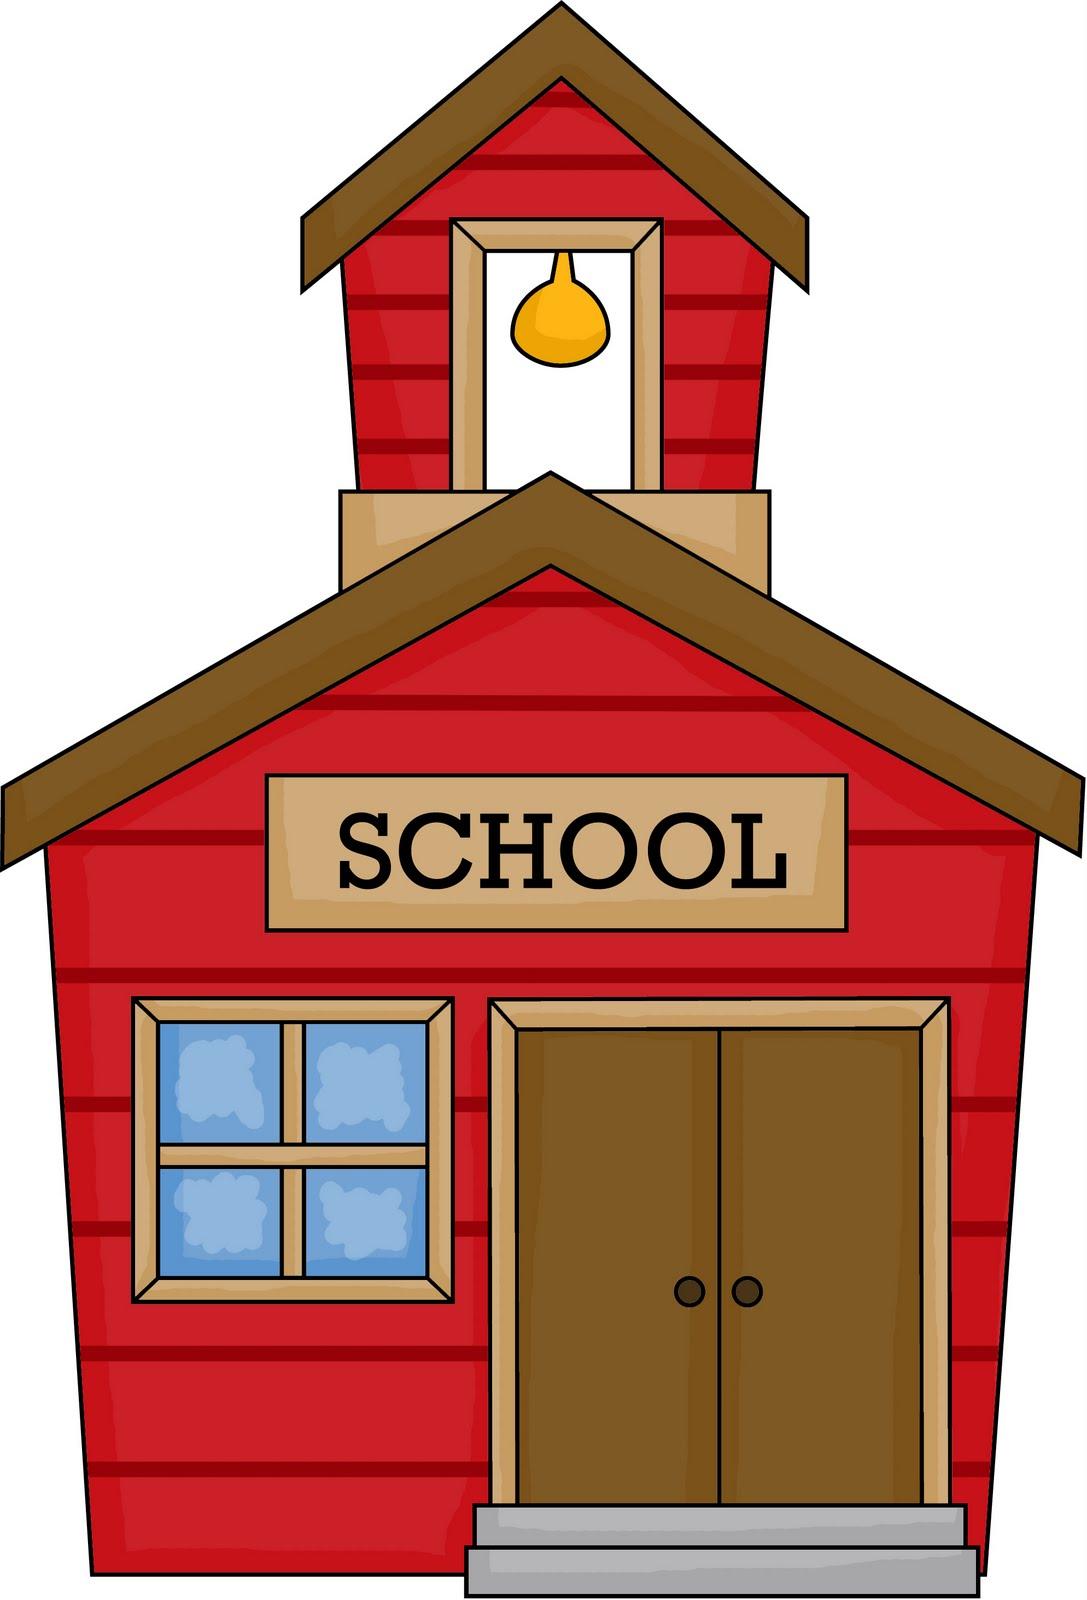 Clipart School Building Clipart Best